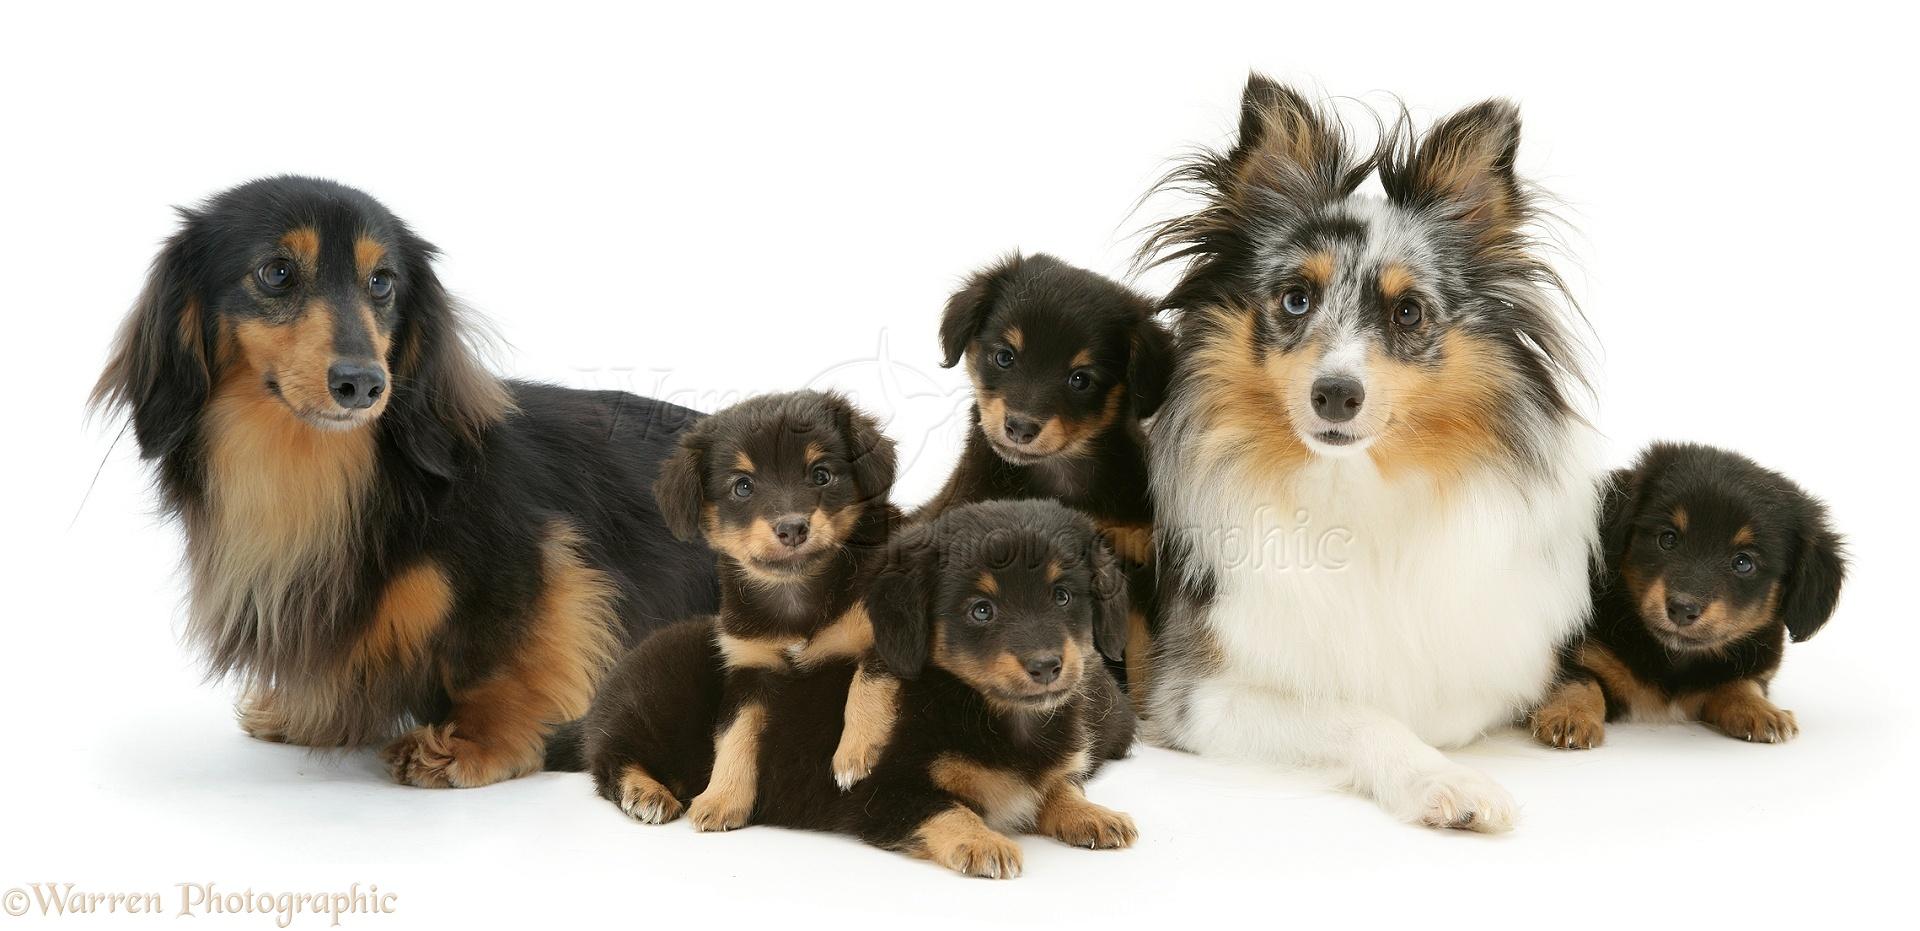 WP10805 Sheltie x Dachshund  Dachshund Sheltie Mix Puppies